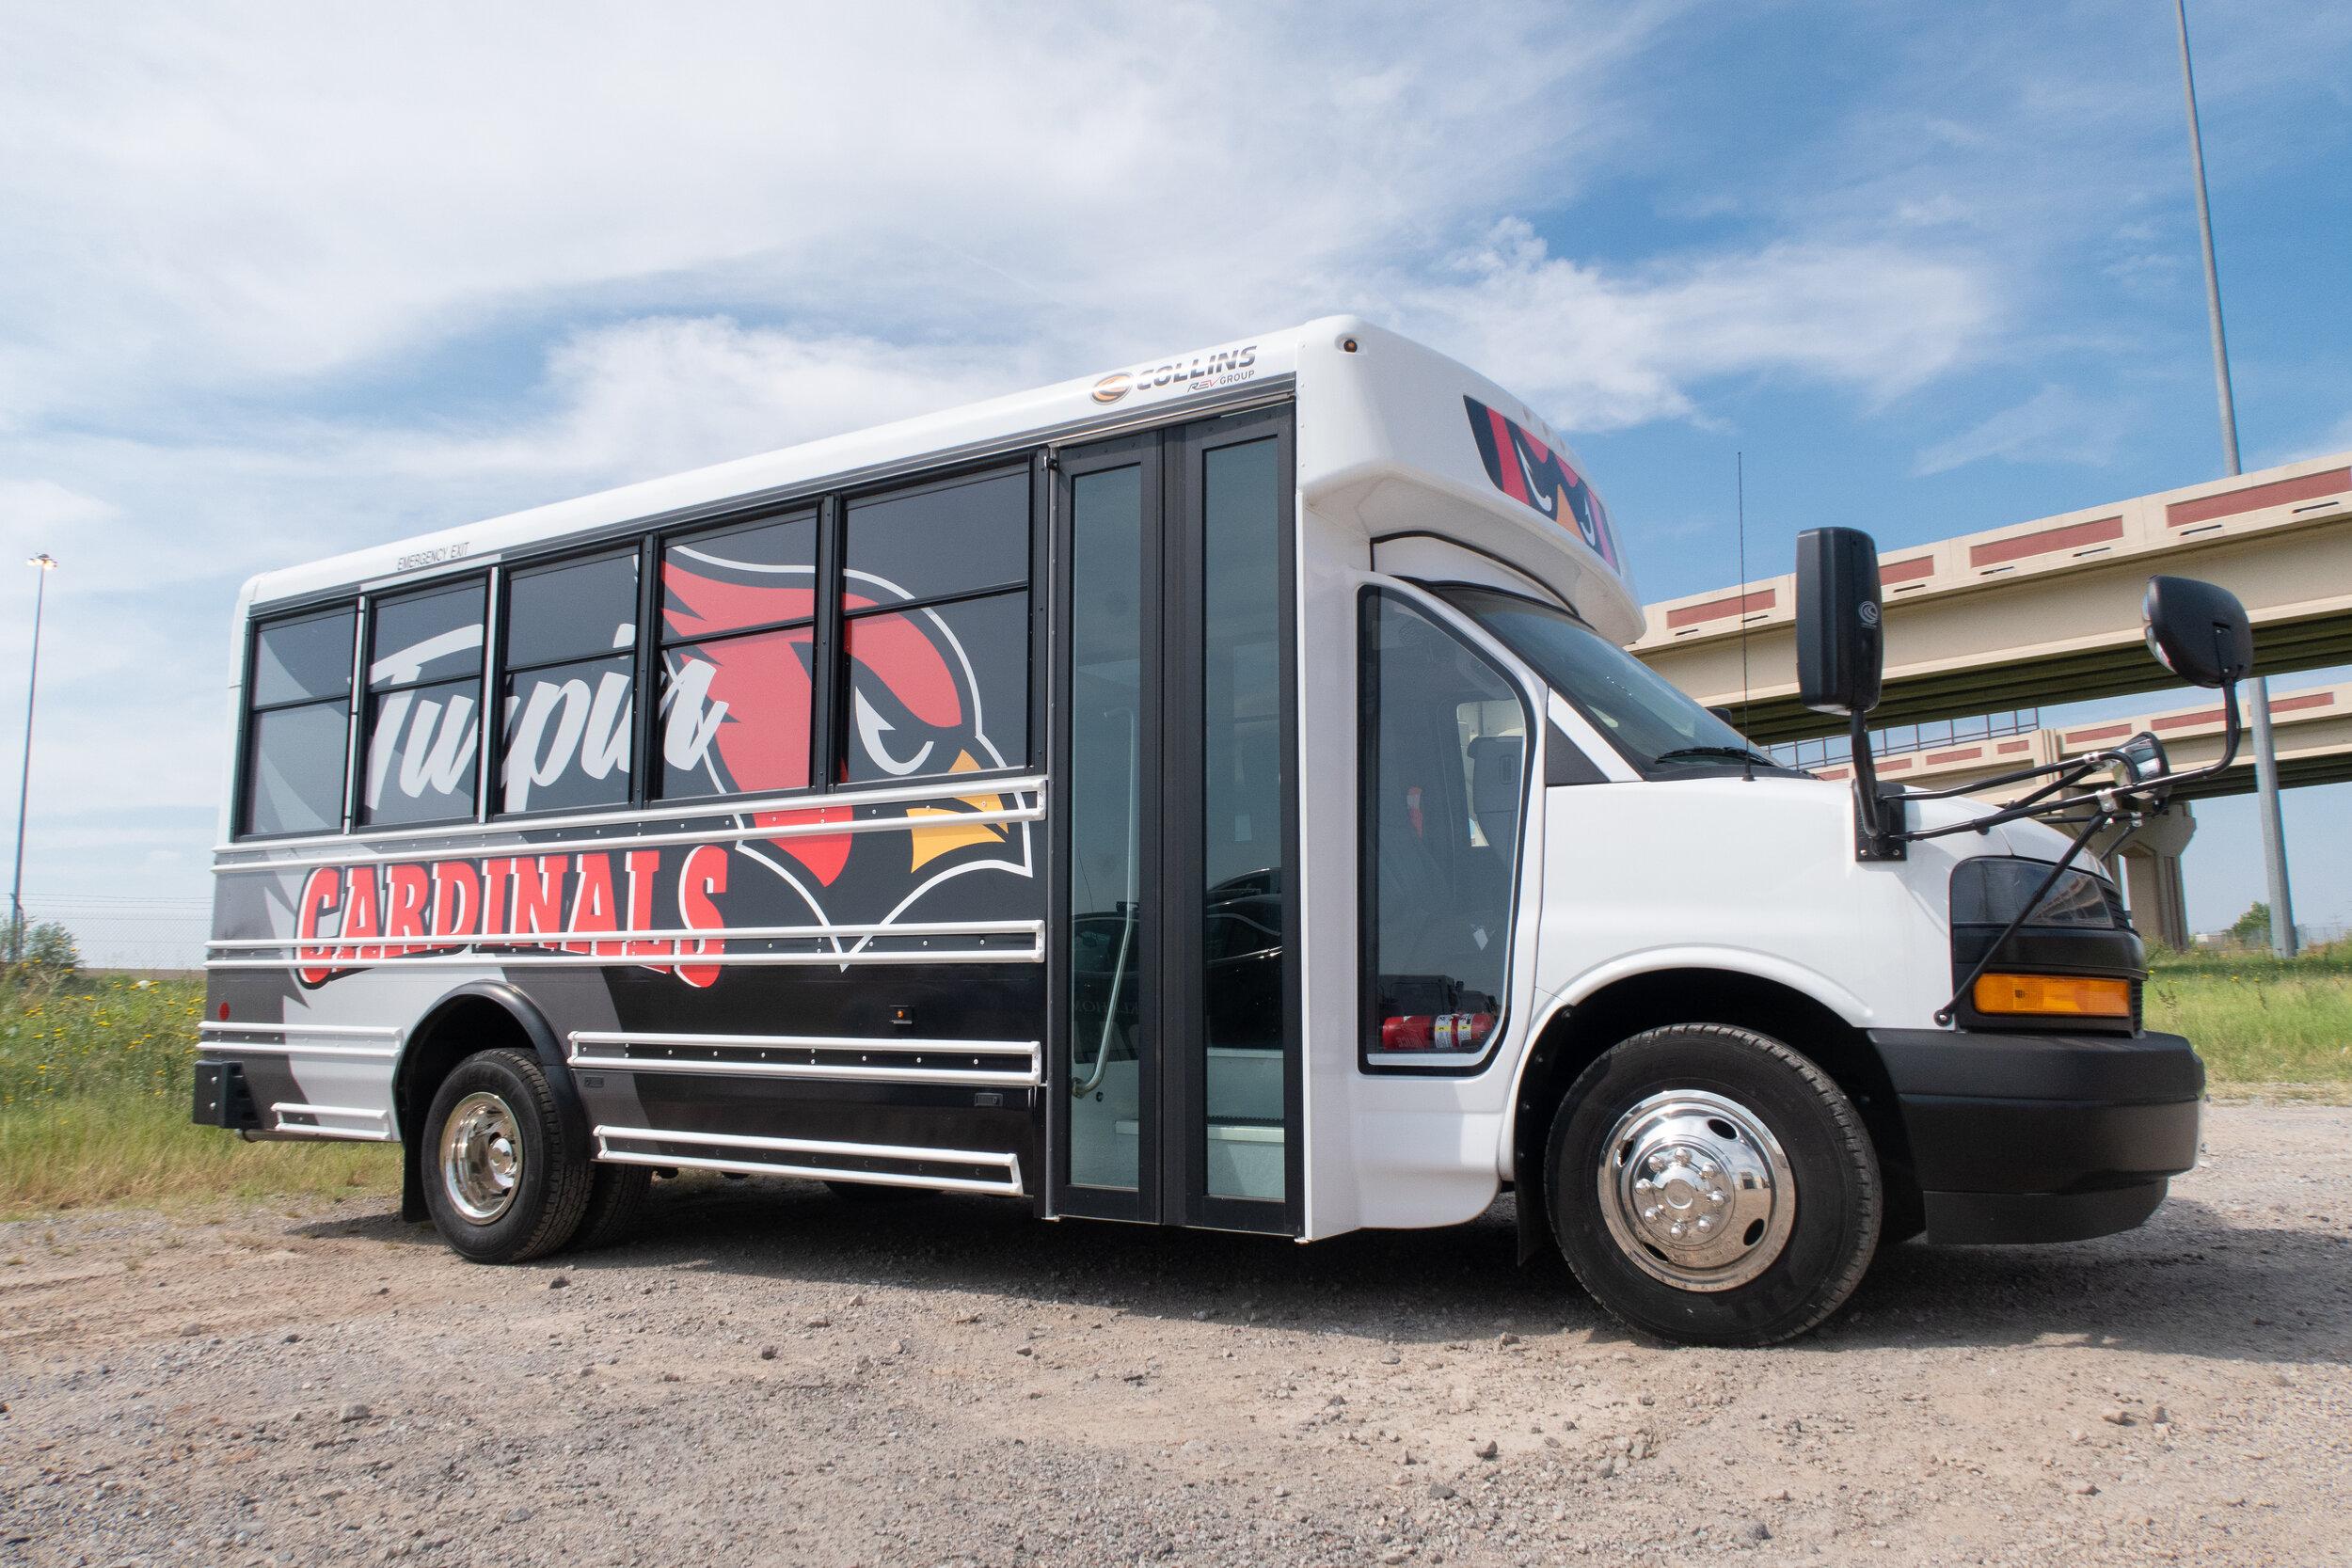 Turpin Cardinals School Bus Wrap.jpg